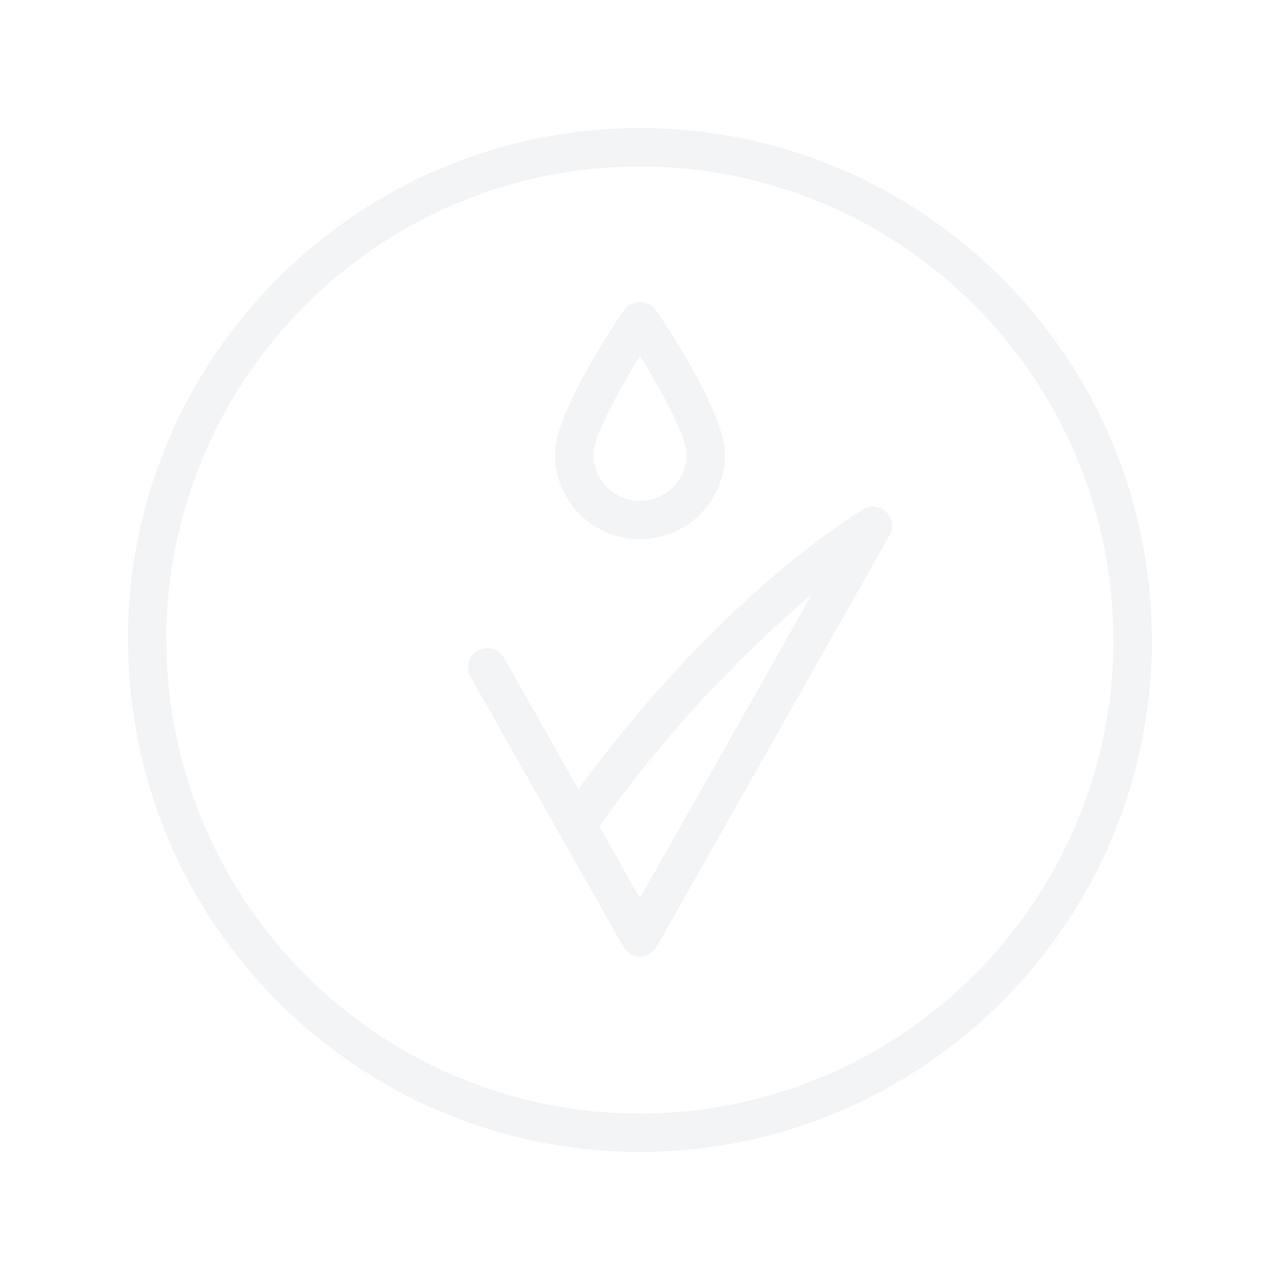 LUUV Sea Buckthorn And Carrot Body Cream 200ml